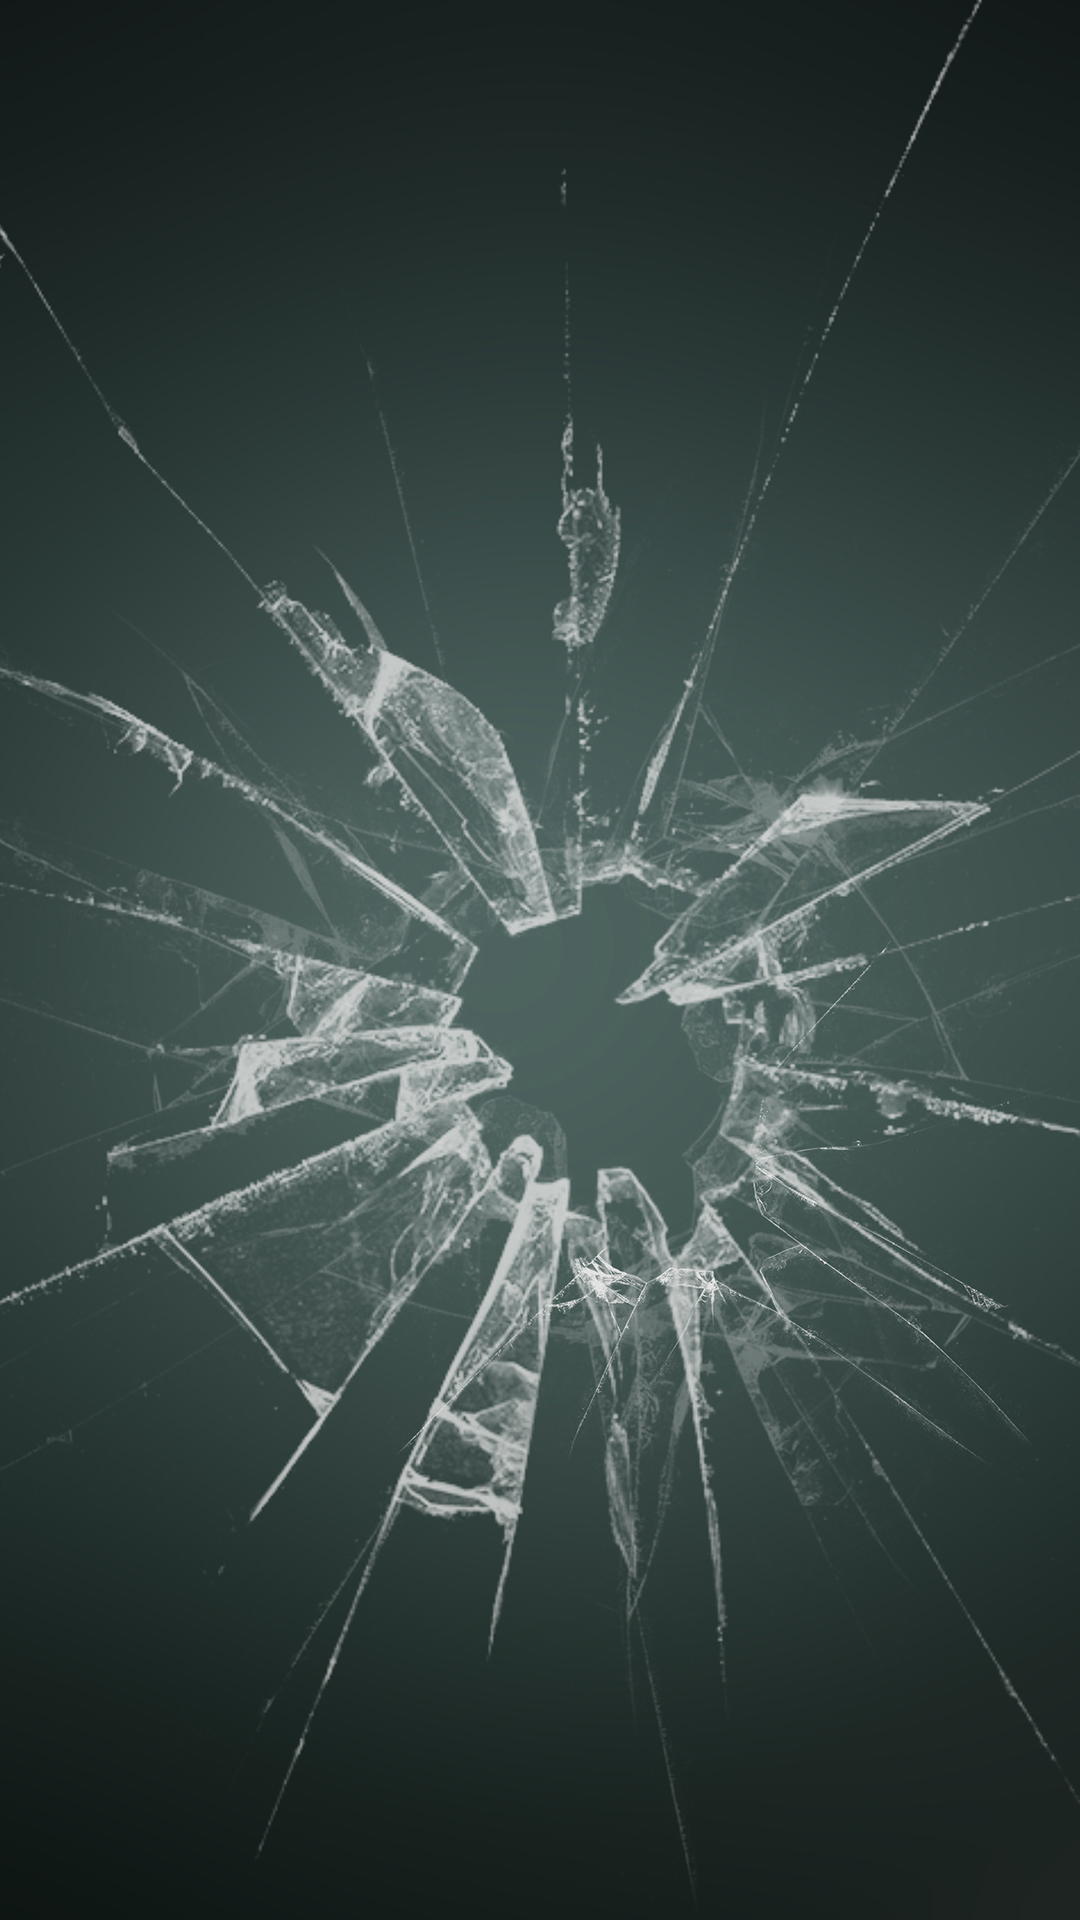 Broken Glass Wallpapers iPhone 6S by lirking20 on DeviantArt